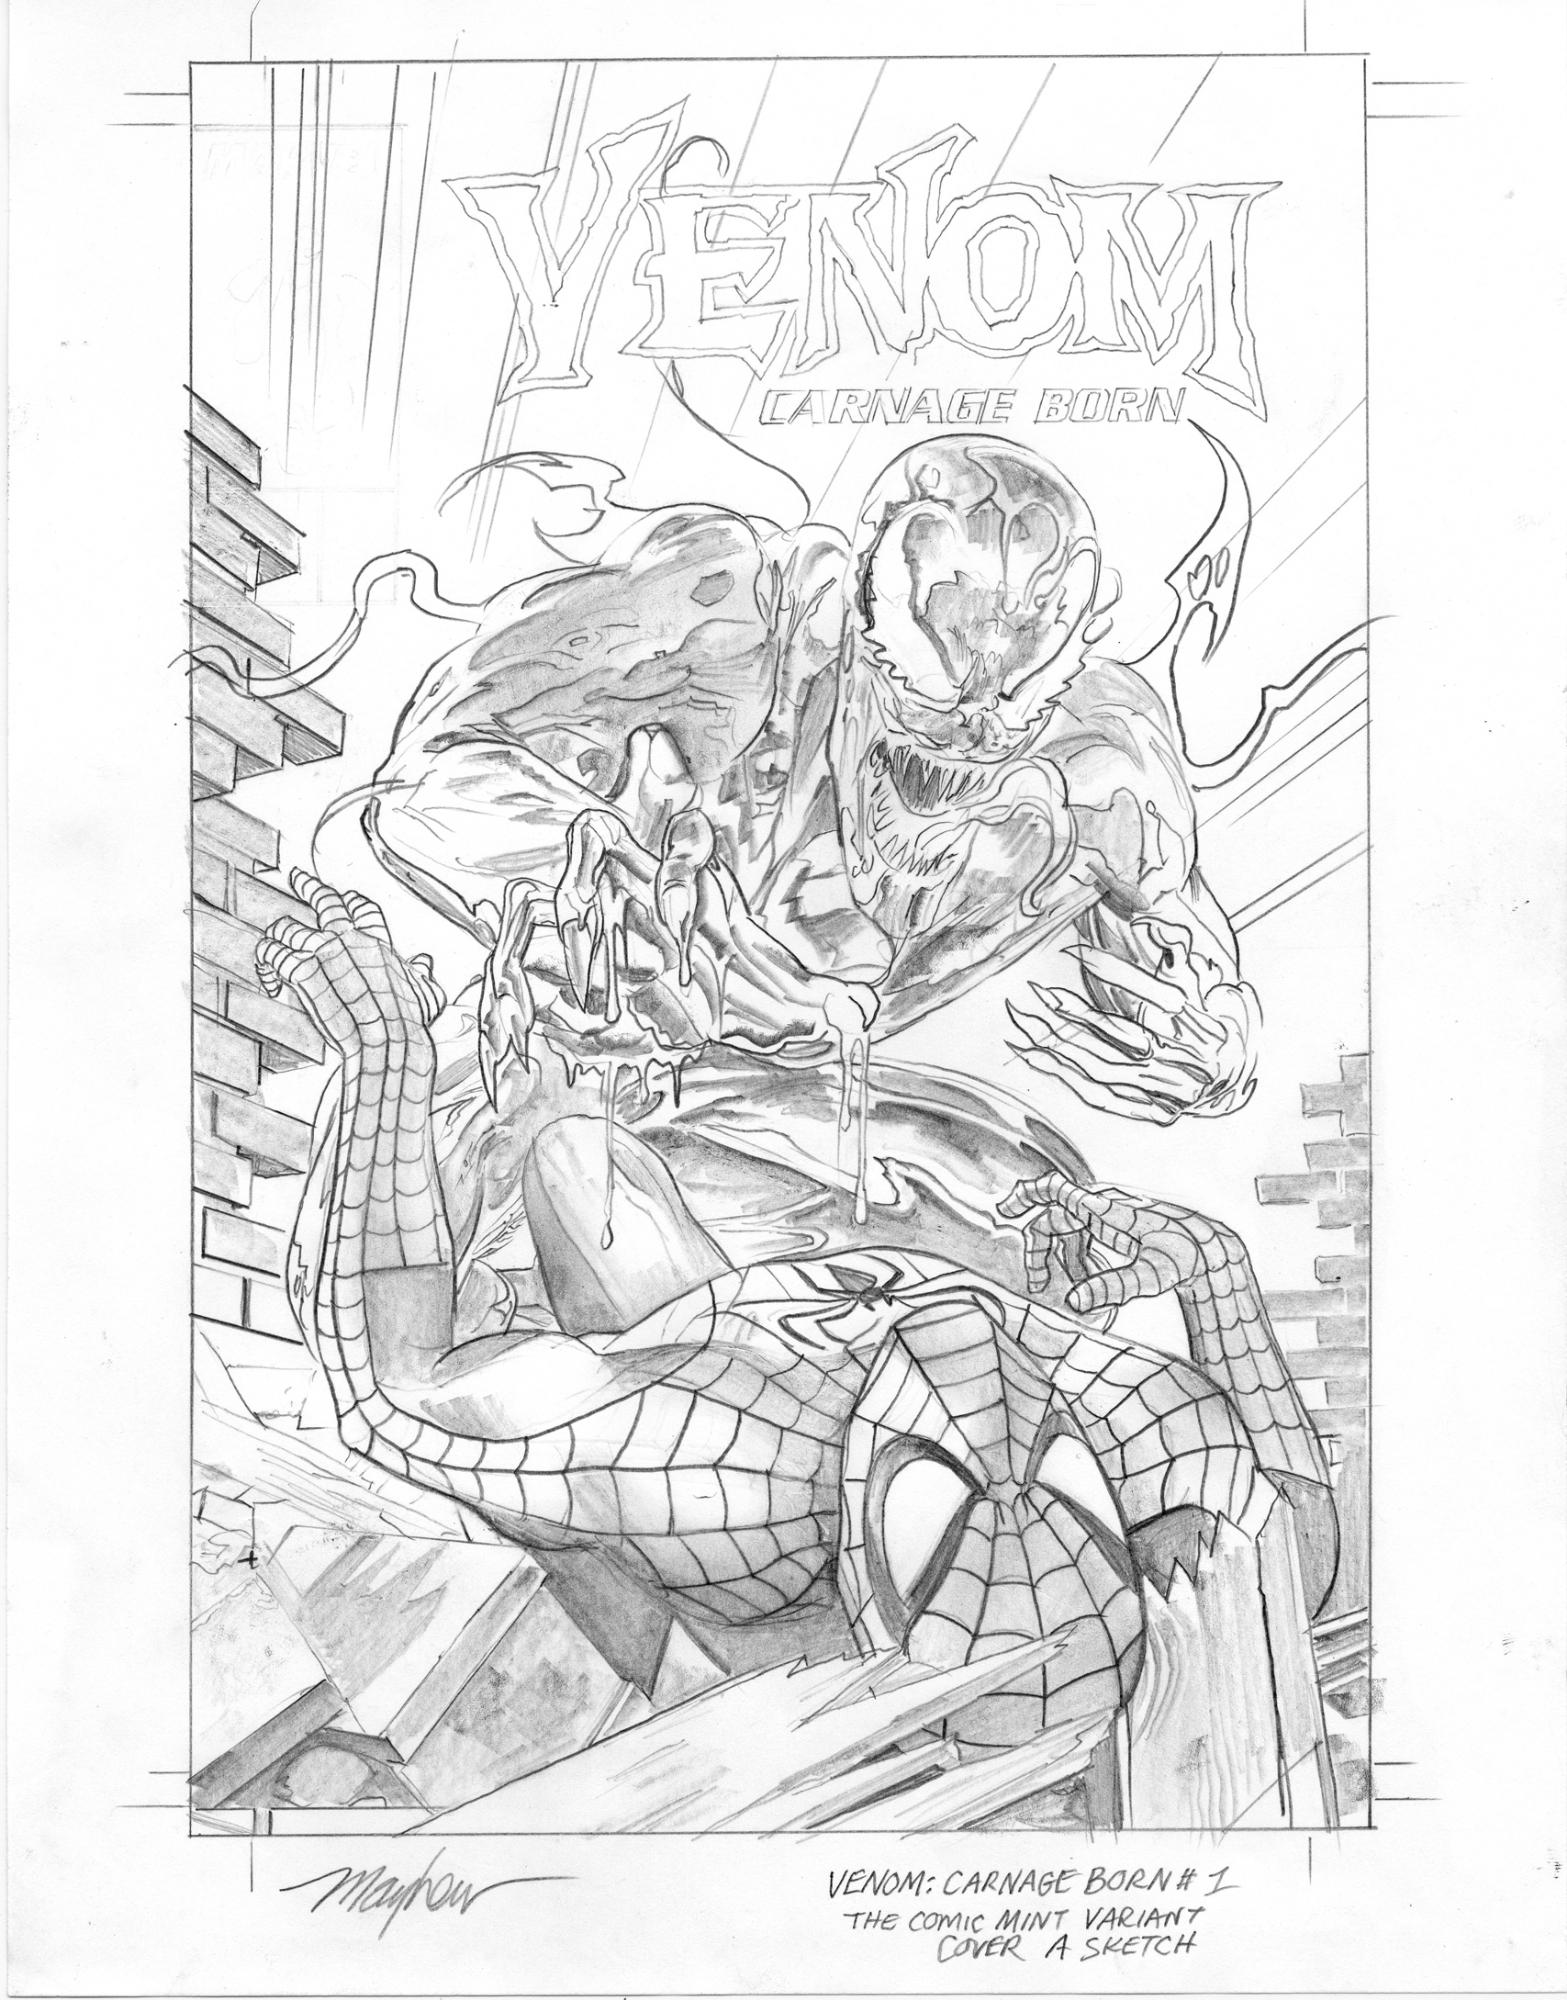 Mike Mayhew Original WEB OF VENOM: CARNAGE BORN #1 Cover